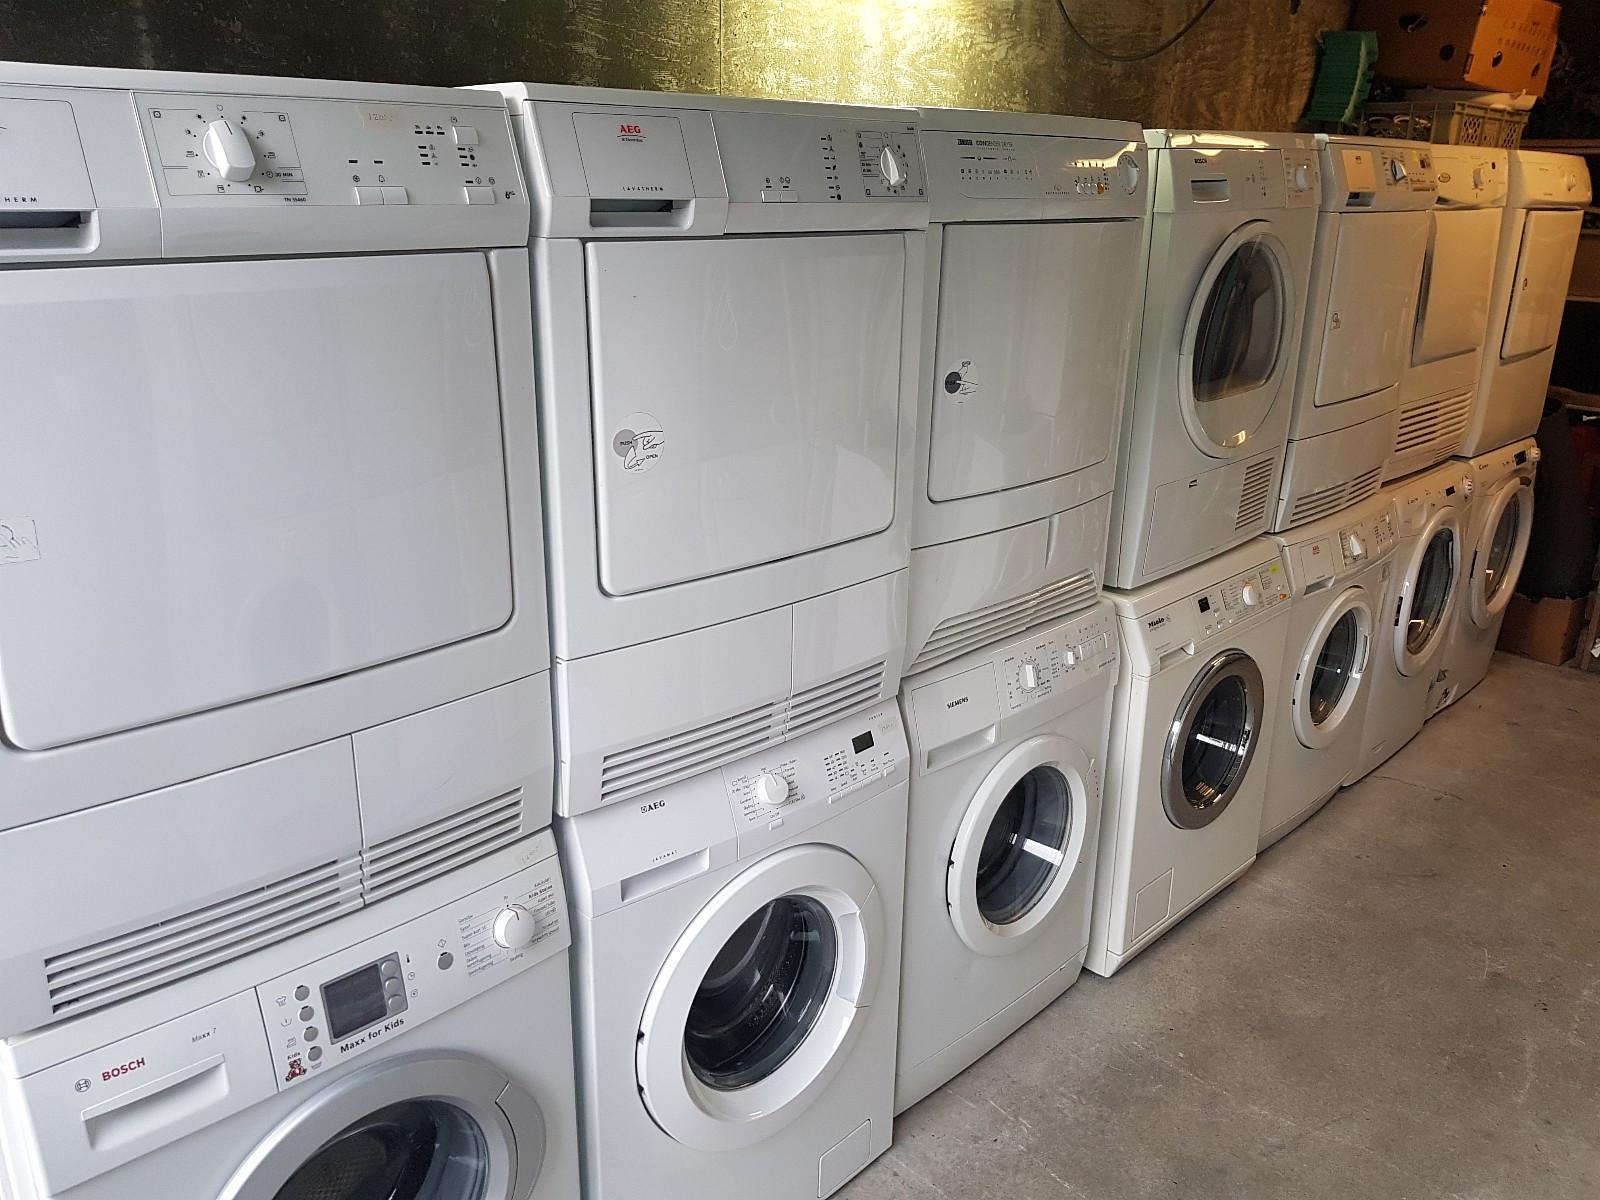 Vaskemaskiner - Med garanti - Bryne  - Vaskemaskiner  Nyoverhalte vaskemaskiner selges med 3 mnd full garanti.   Ulike merker: AEG / Electrolux / Whirlpool / Bosch / Bauknecht / Siemens / Samsung  1200 - 1600 o/min 6-9 kg. - Bryne